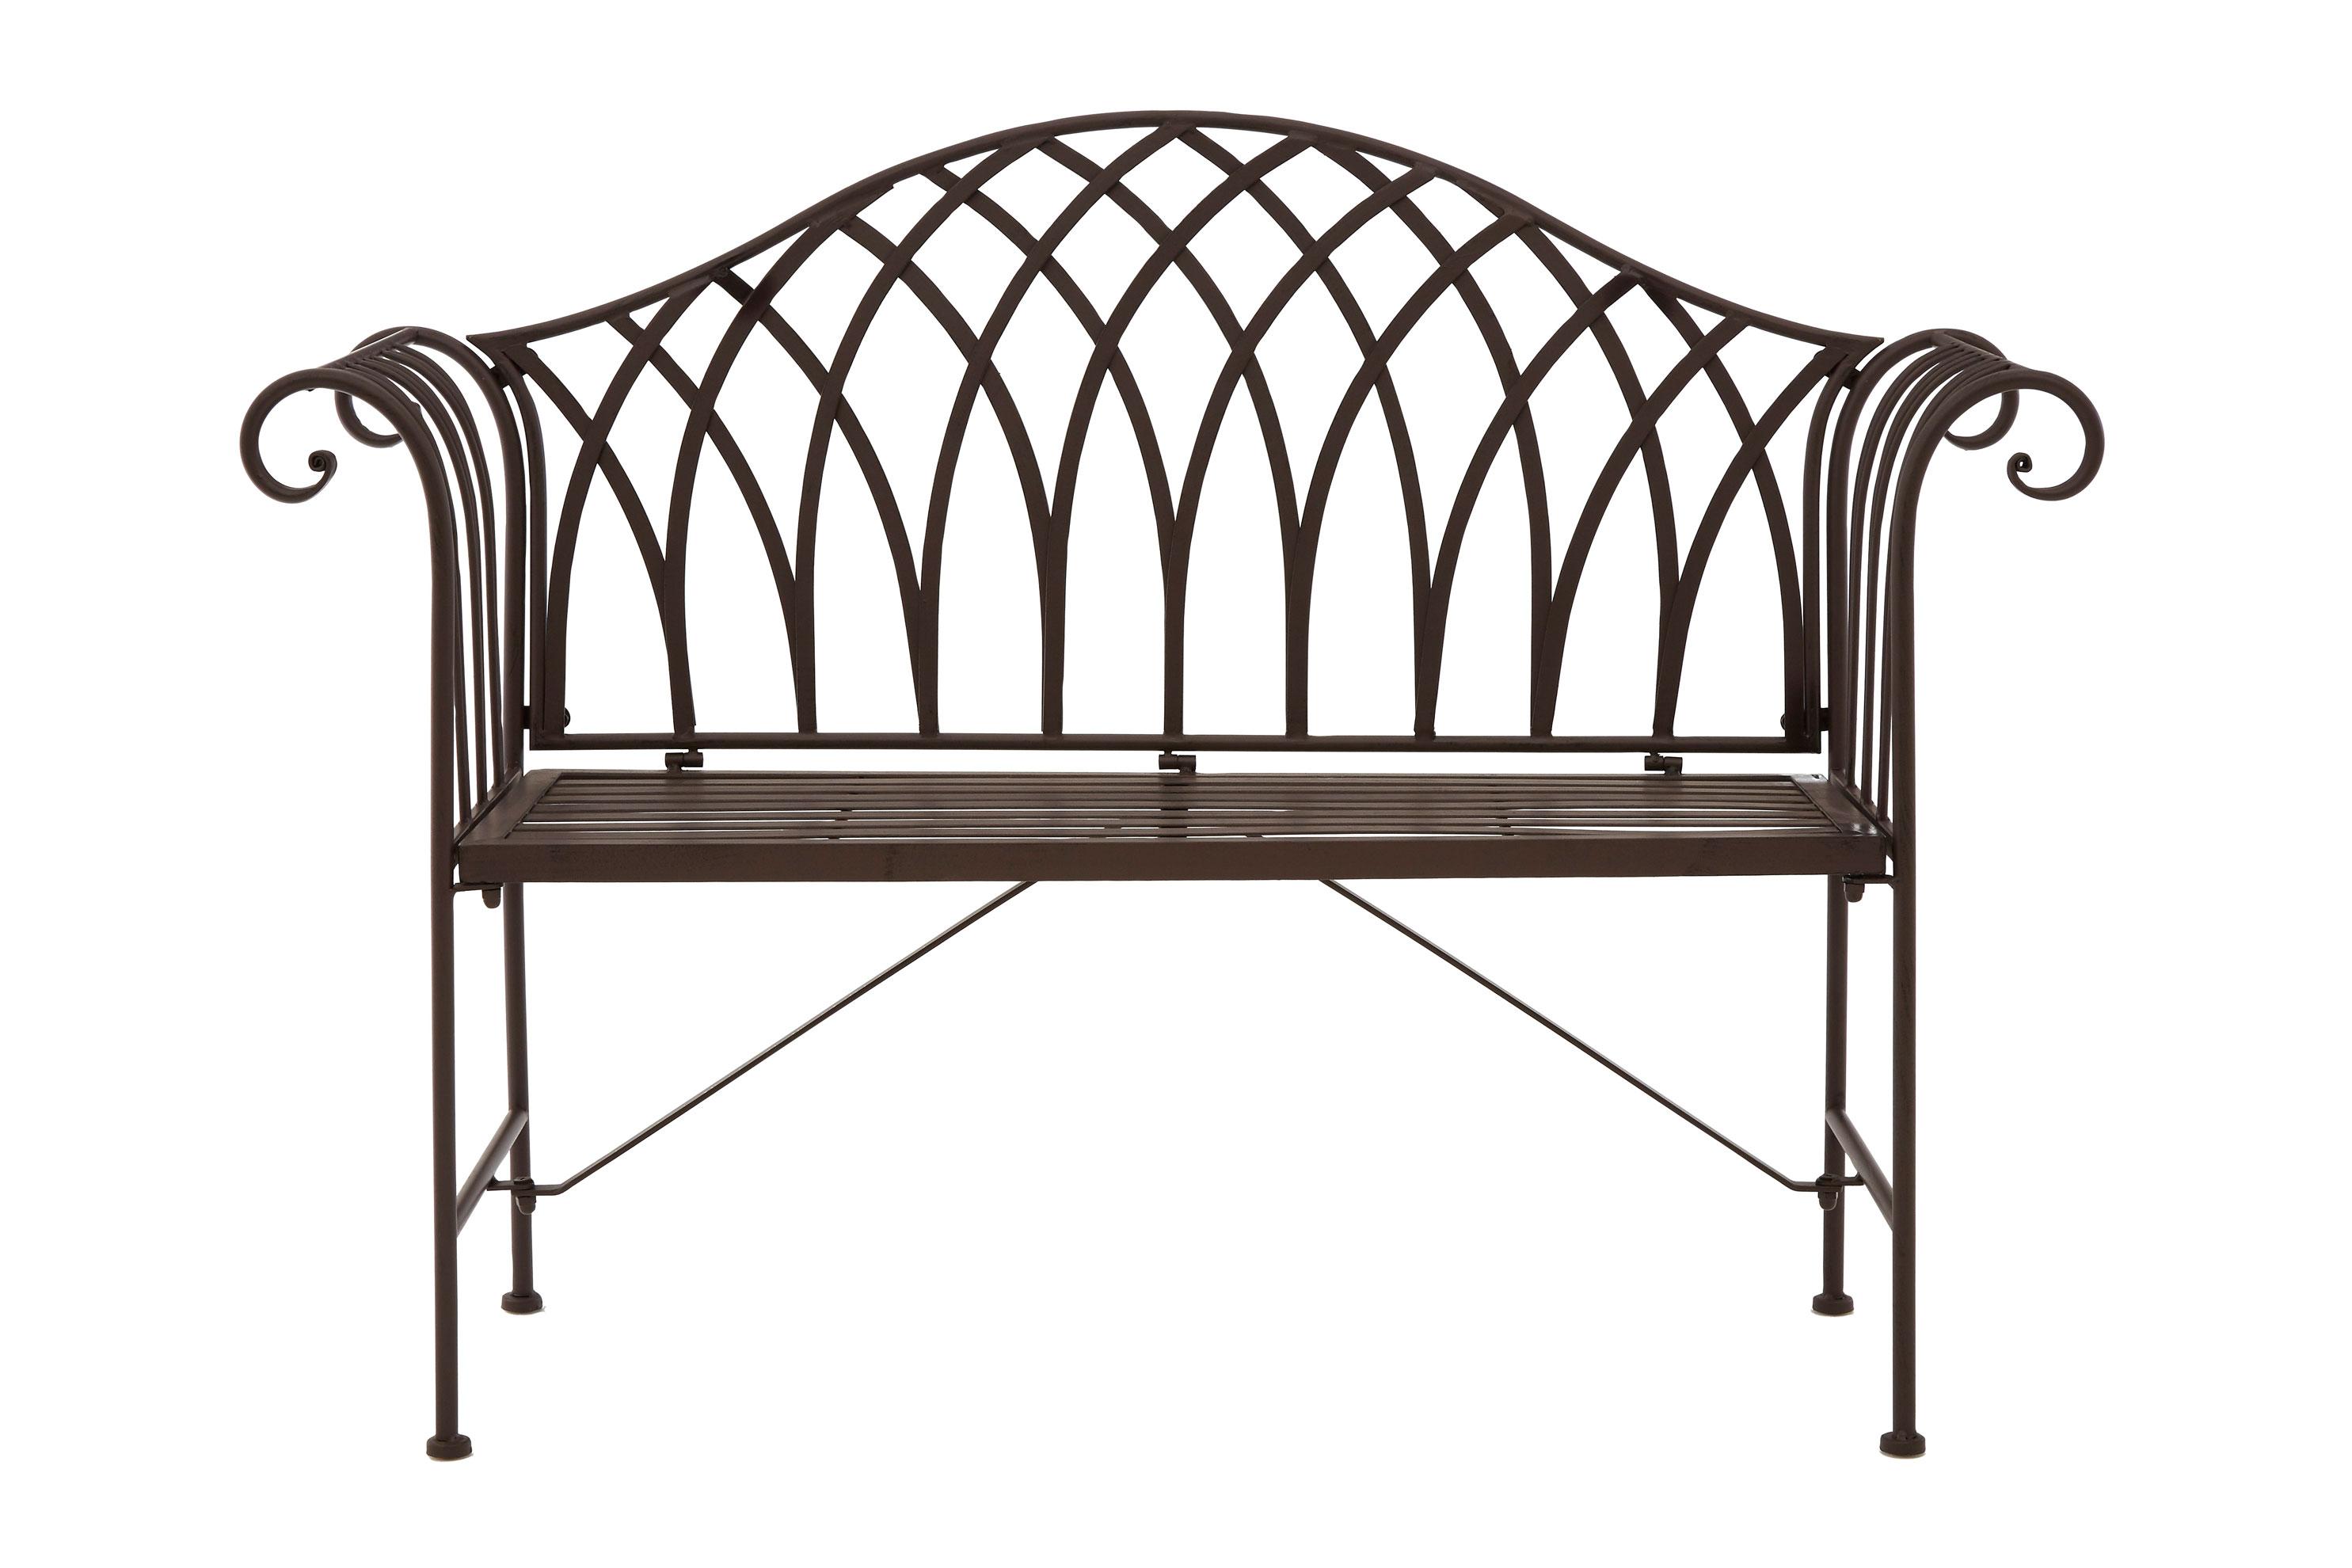 Ornate Wrought Iron Metal Bench Antique Brown Patio Garden Decorative Ebay